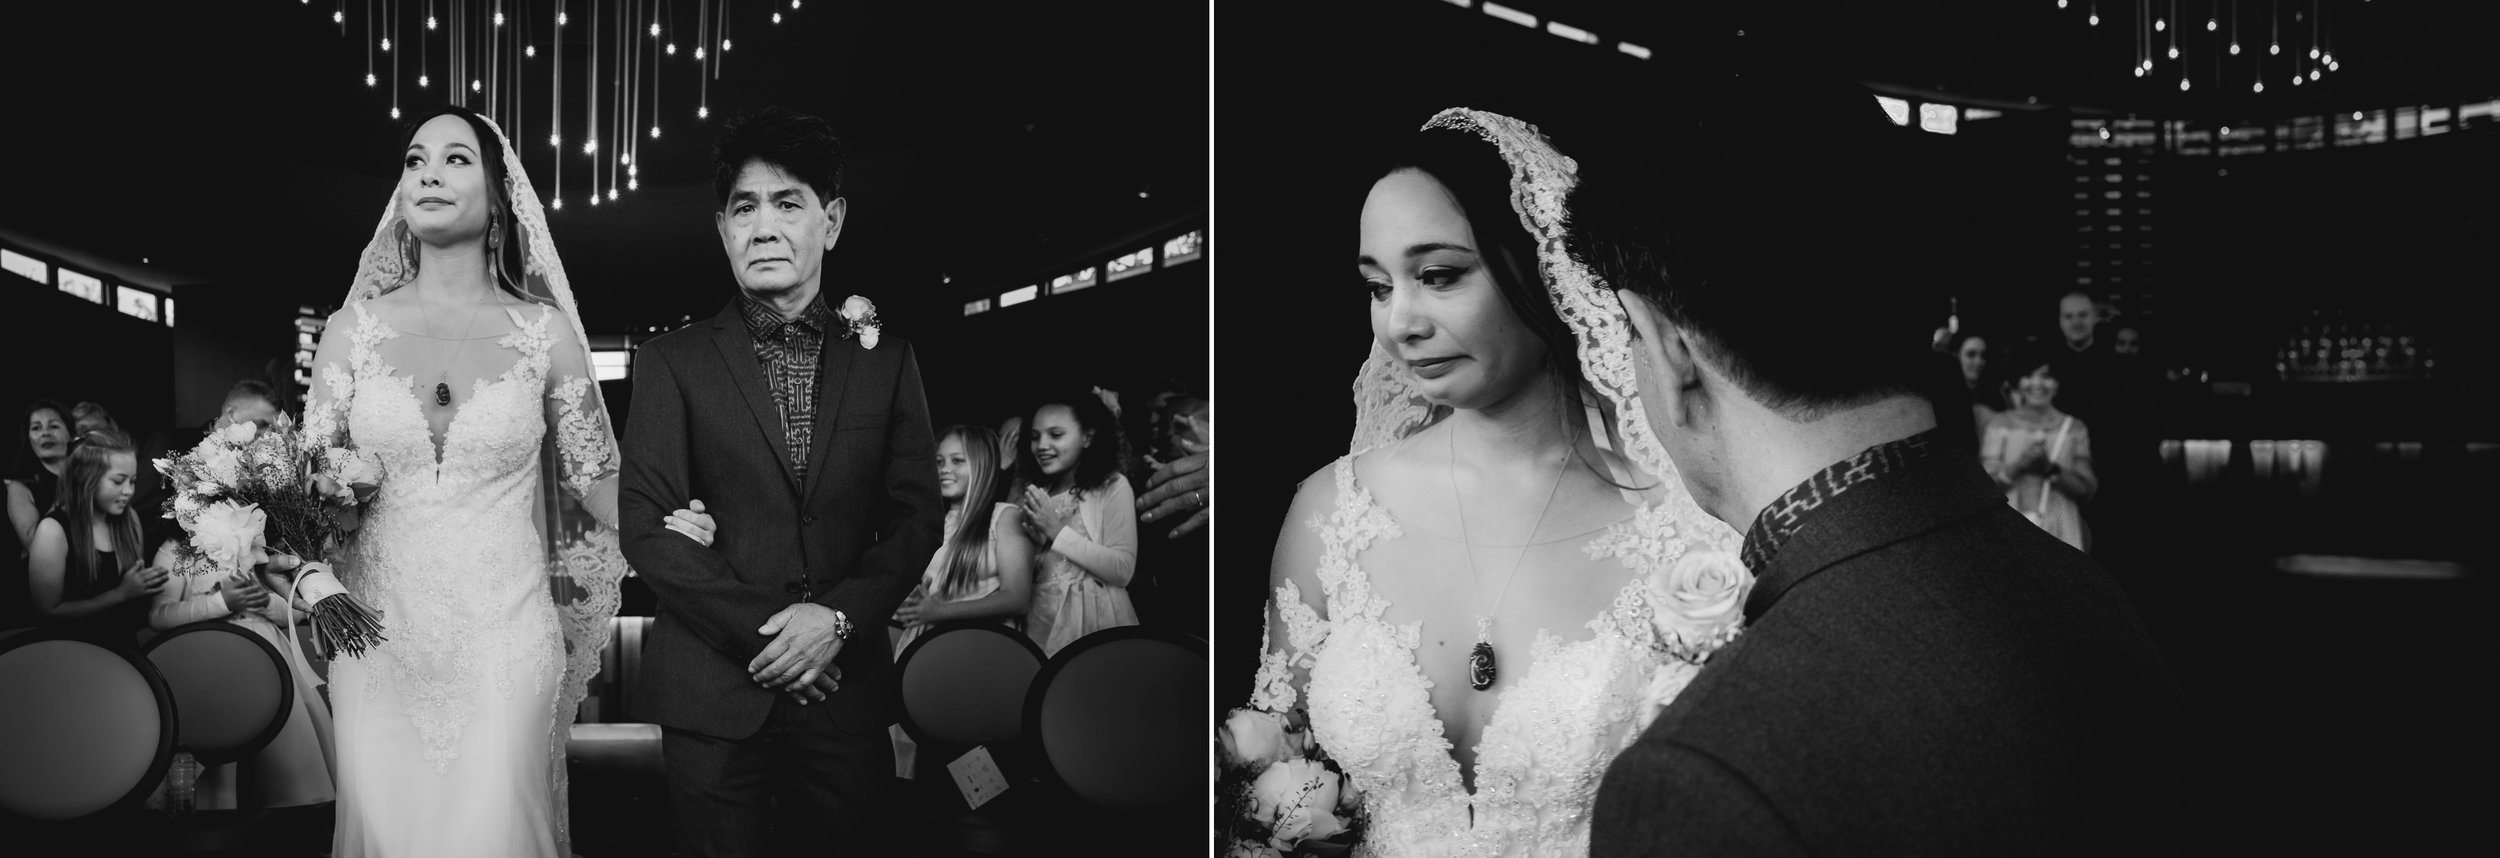 bruidsfotografie-amsterdam-utrecht-trouwfotograaf-mark-hadden-wedding-photography-Robin & Guus-168-2 copy.jpg